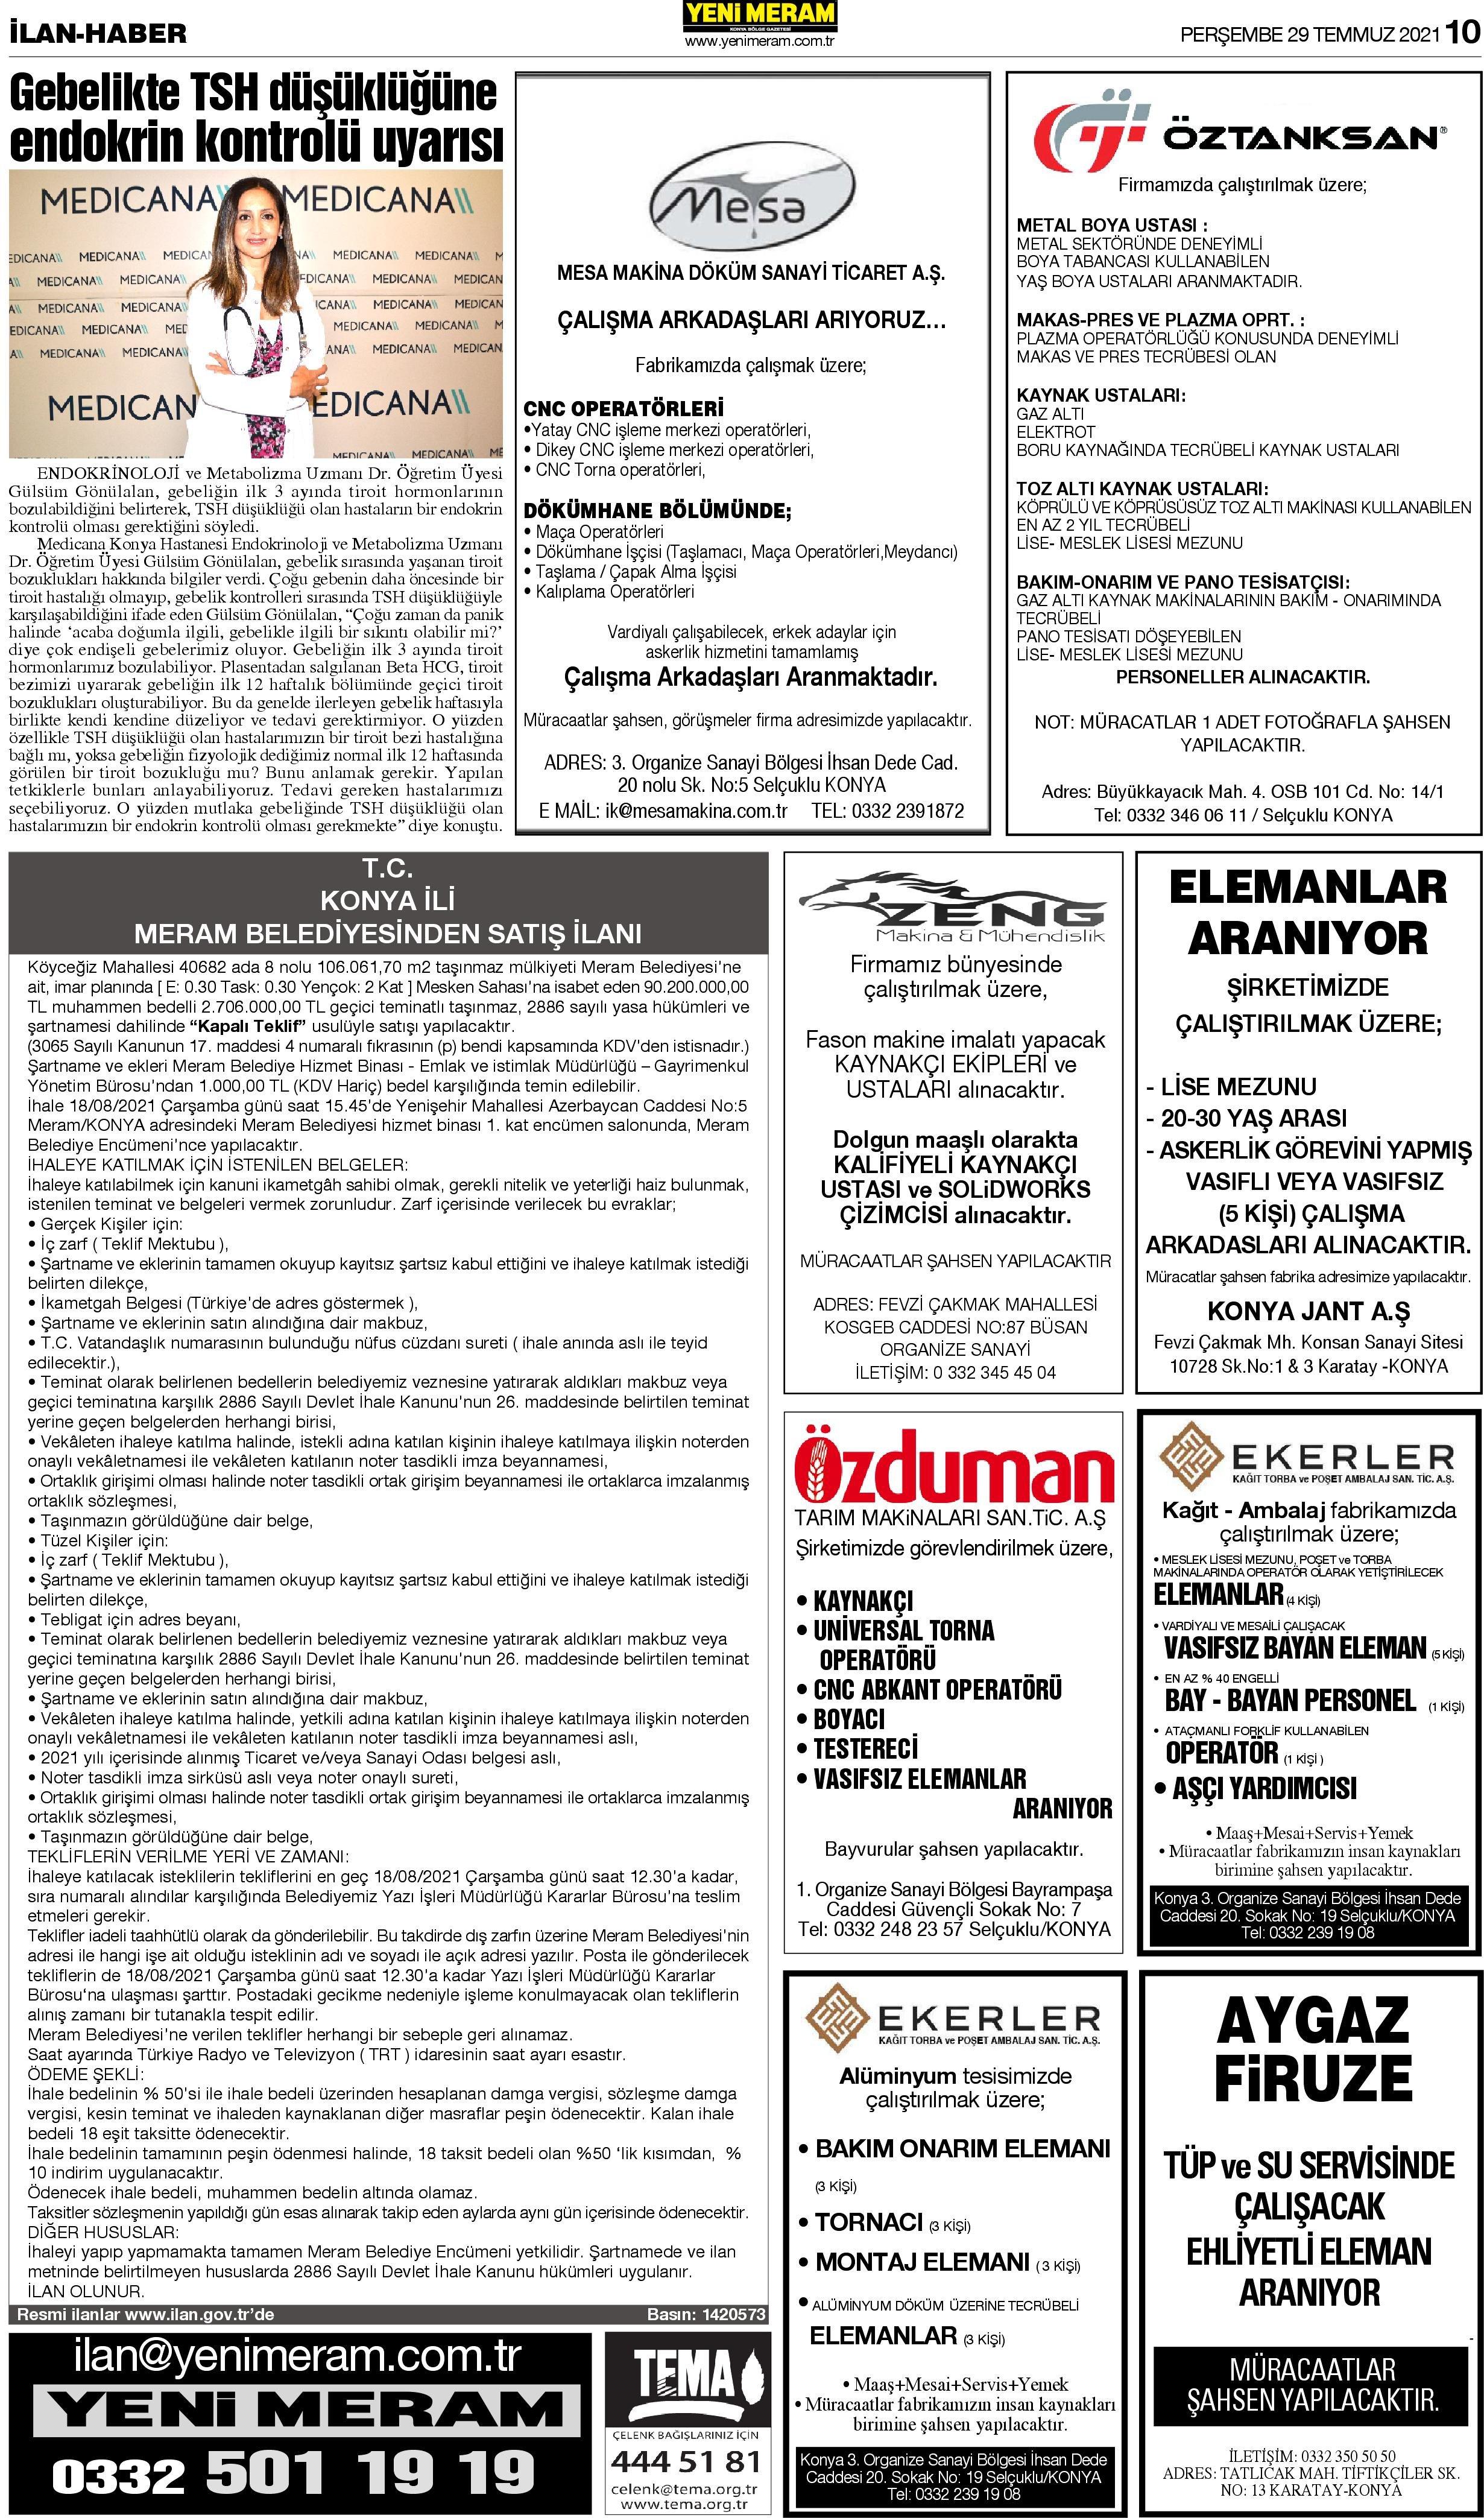 29 Temmuz 2021 Yeni Meram Gazetesi